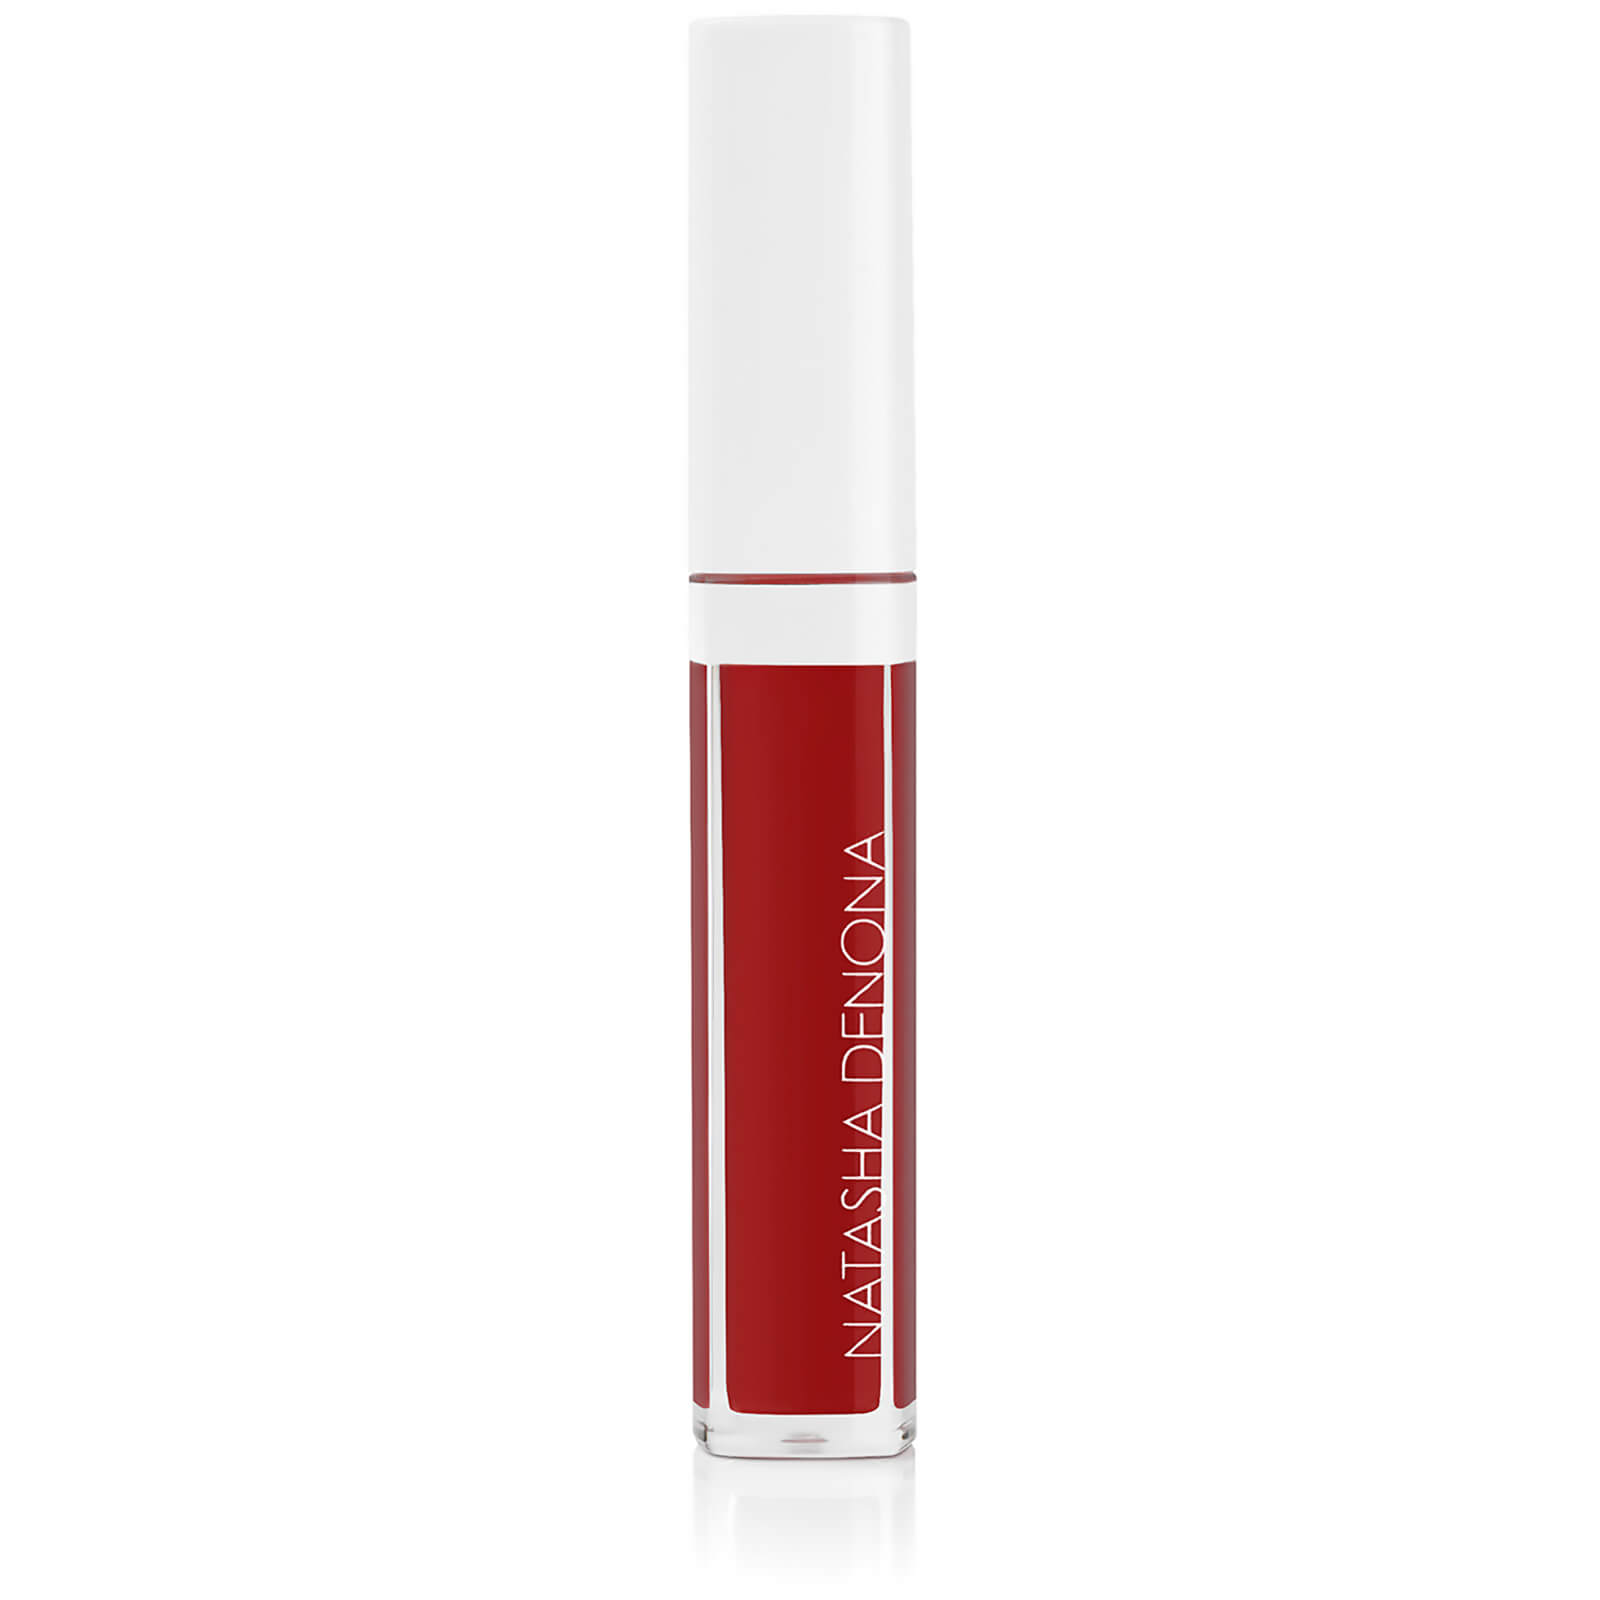 Natasha Denona Lip Glaze 4ml (Various Shades) - 10 Red